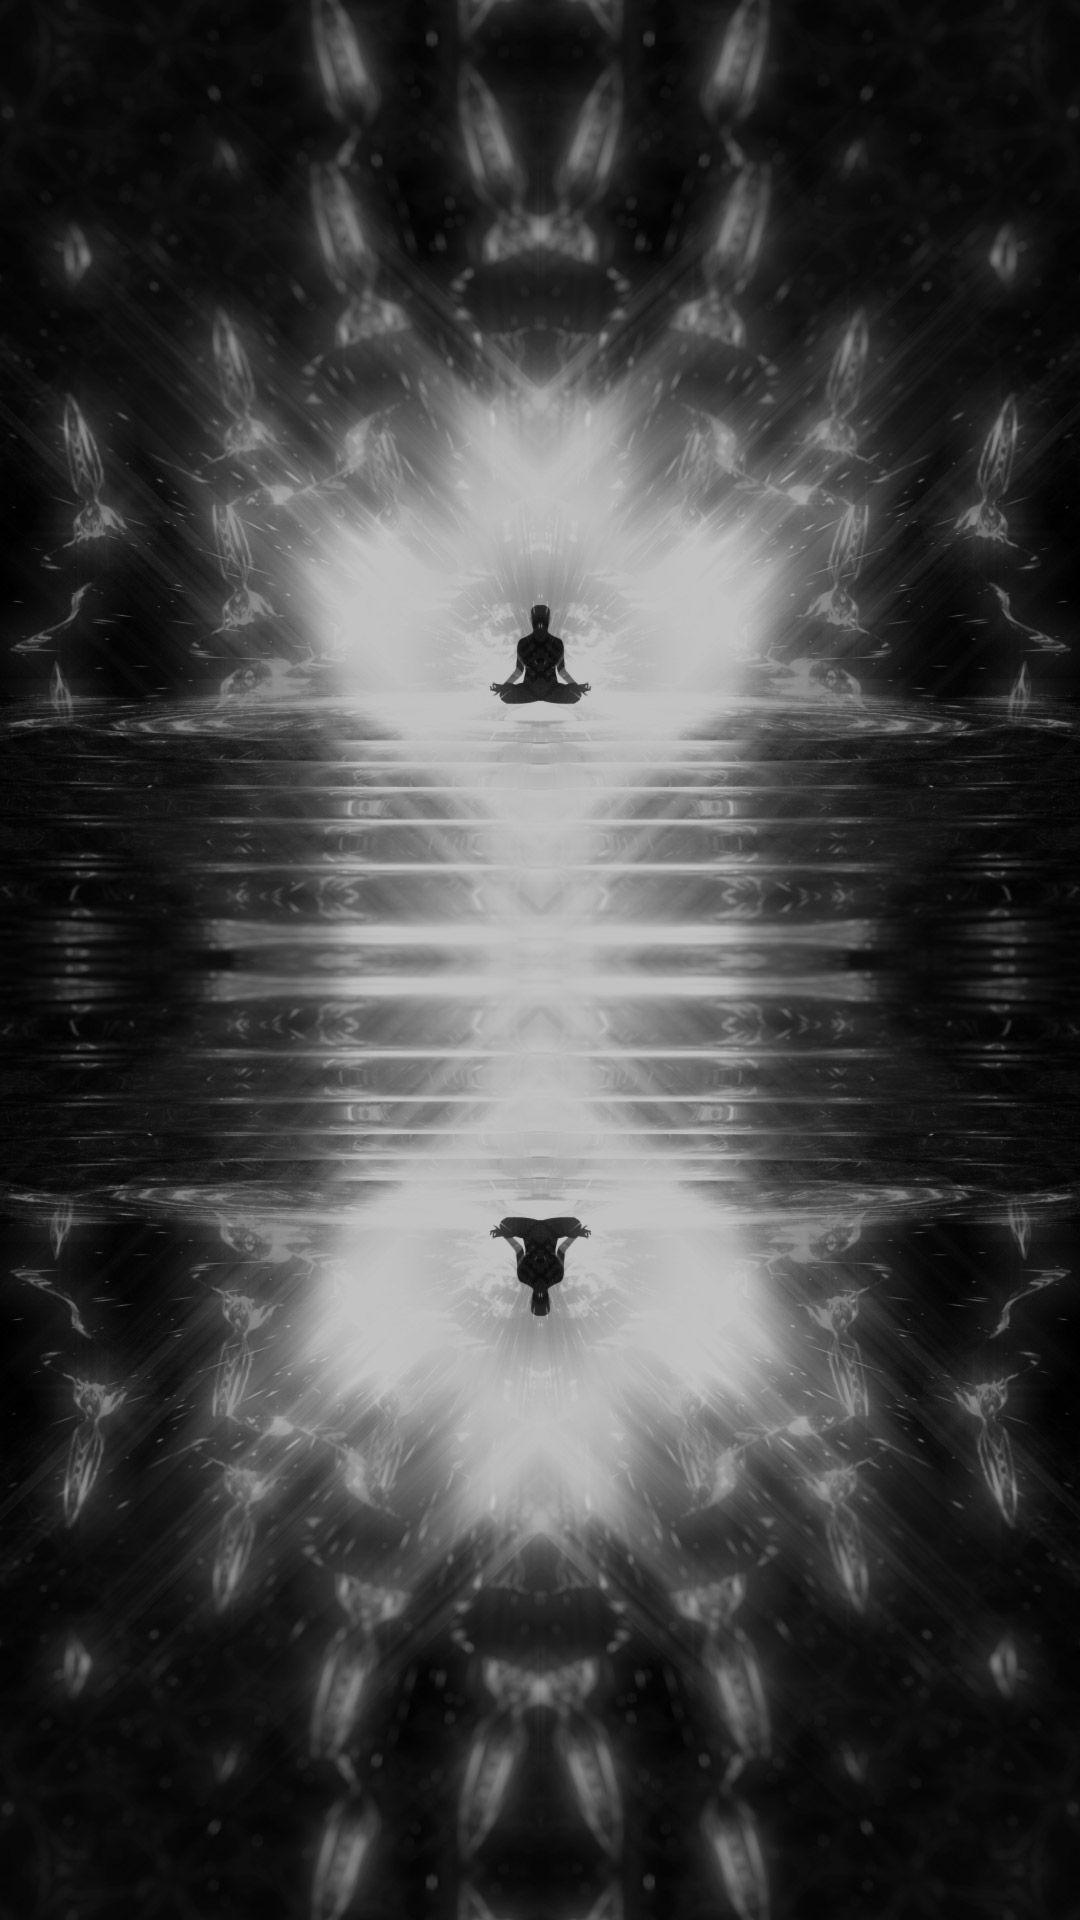 3d Wallpapery Bufo Alvarius The Underground Secret Underground Spirituality Ostrava